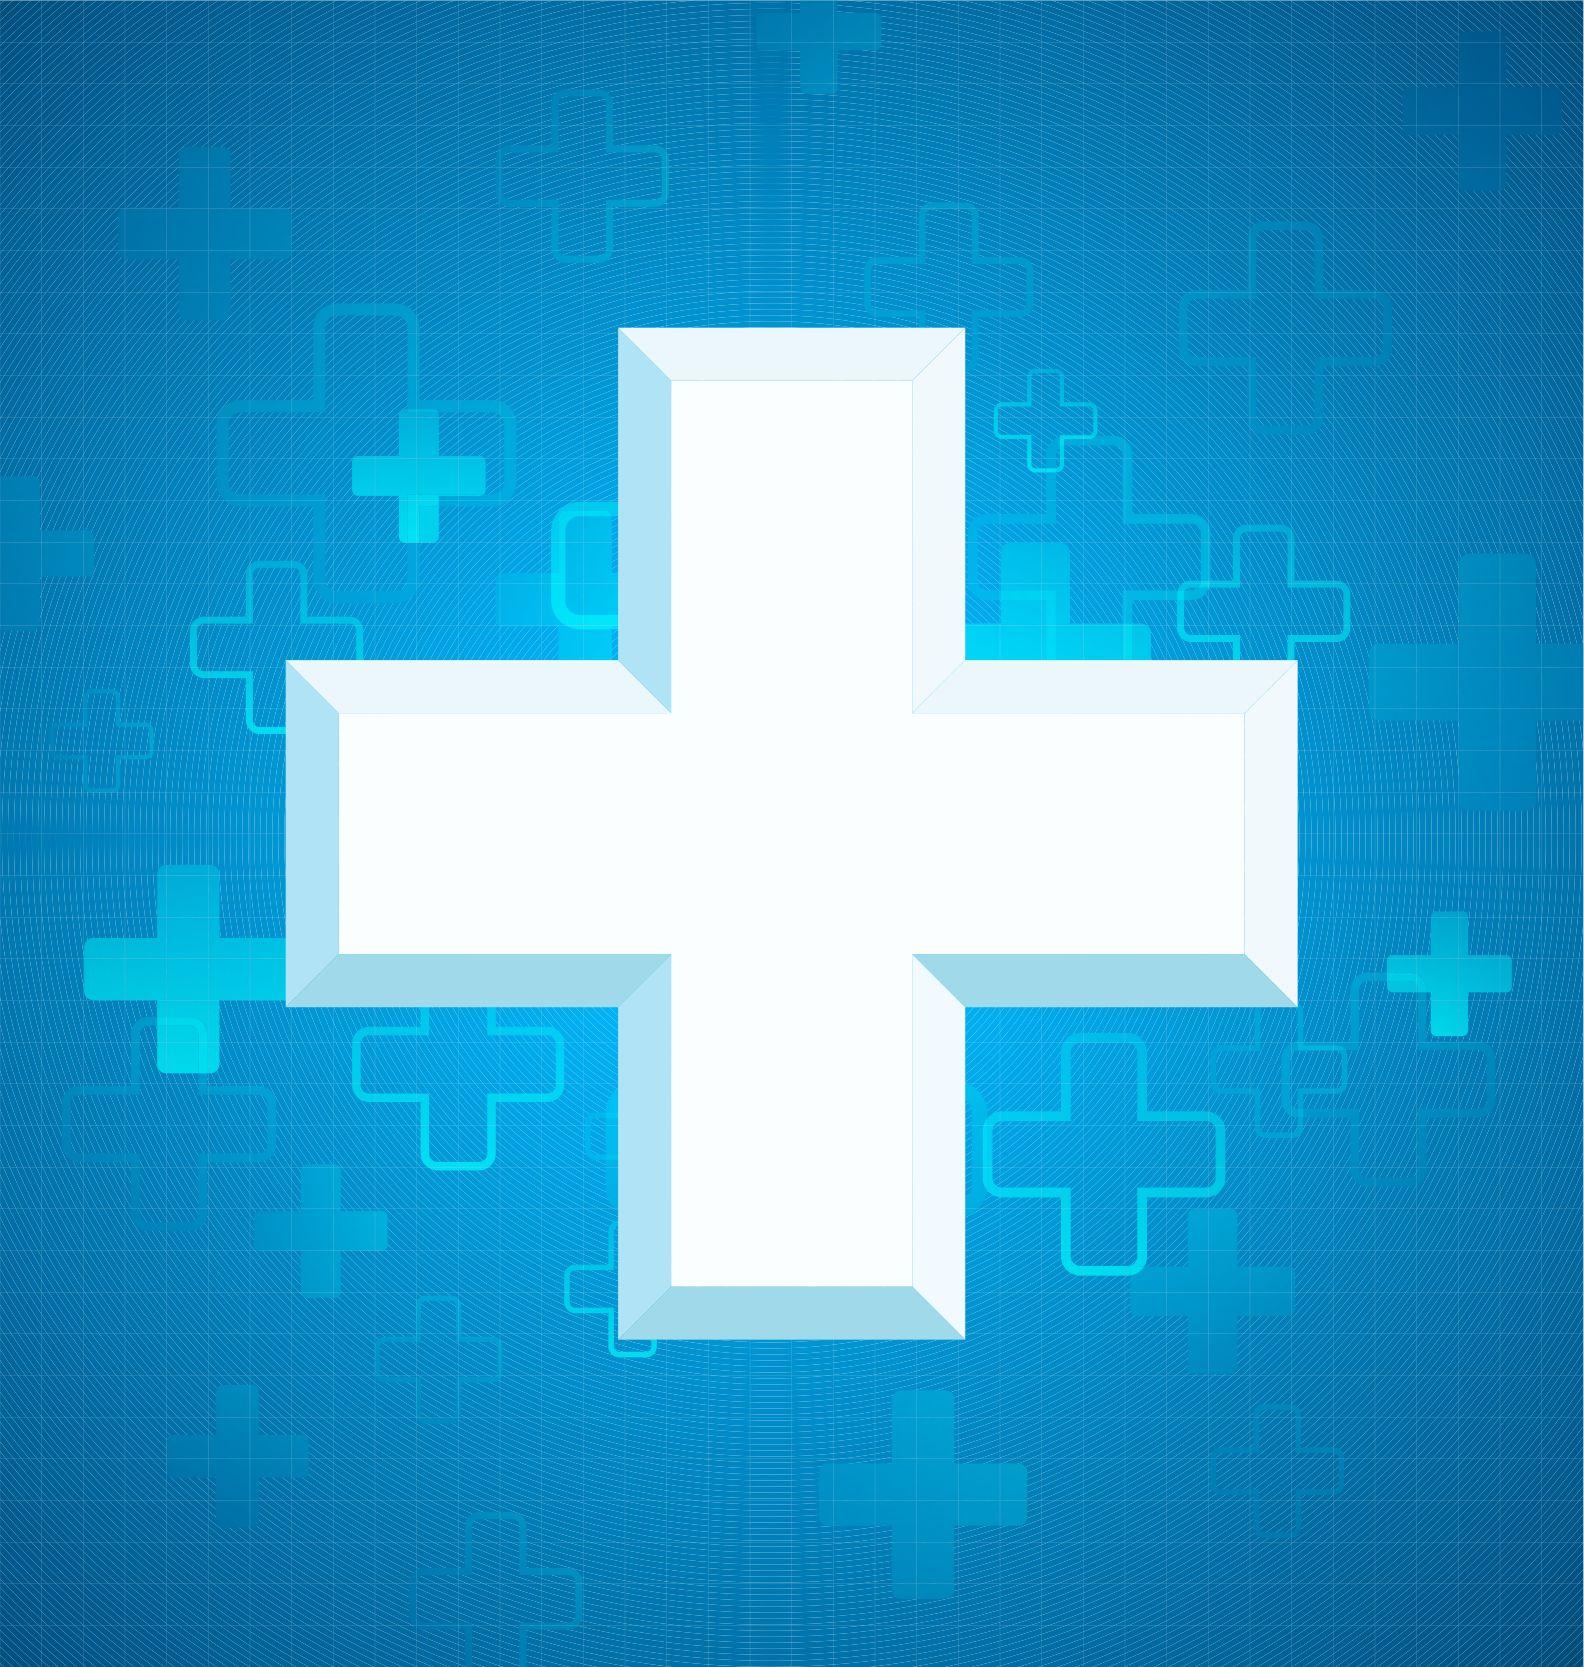 shutterstock_135845942 Health symbol Chemscape.jpg